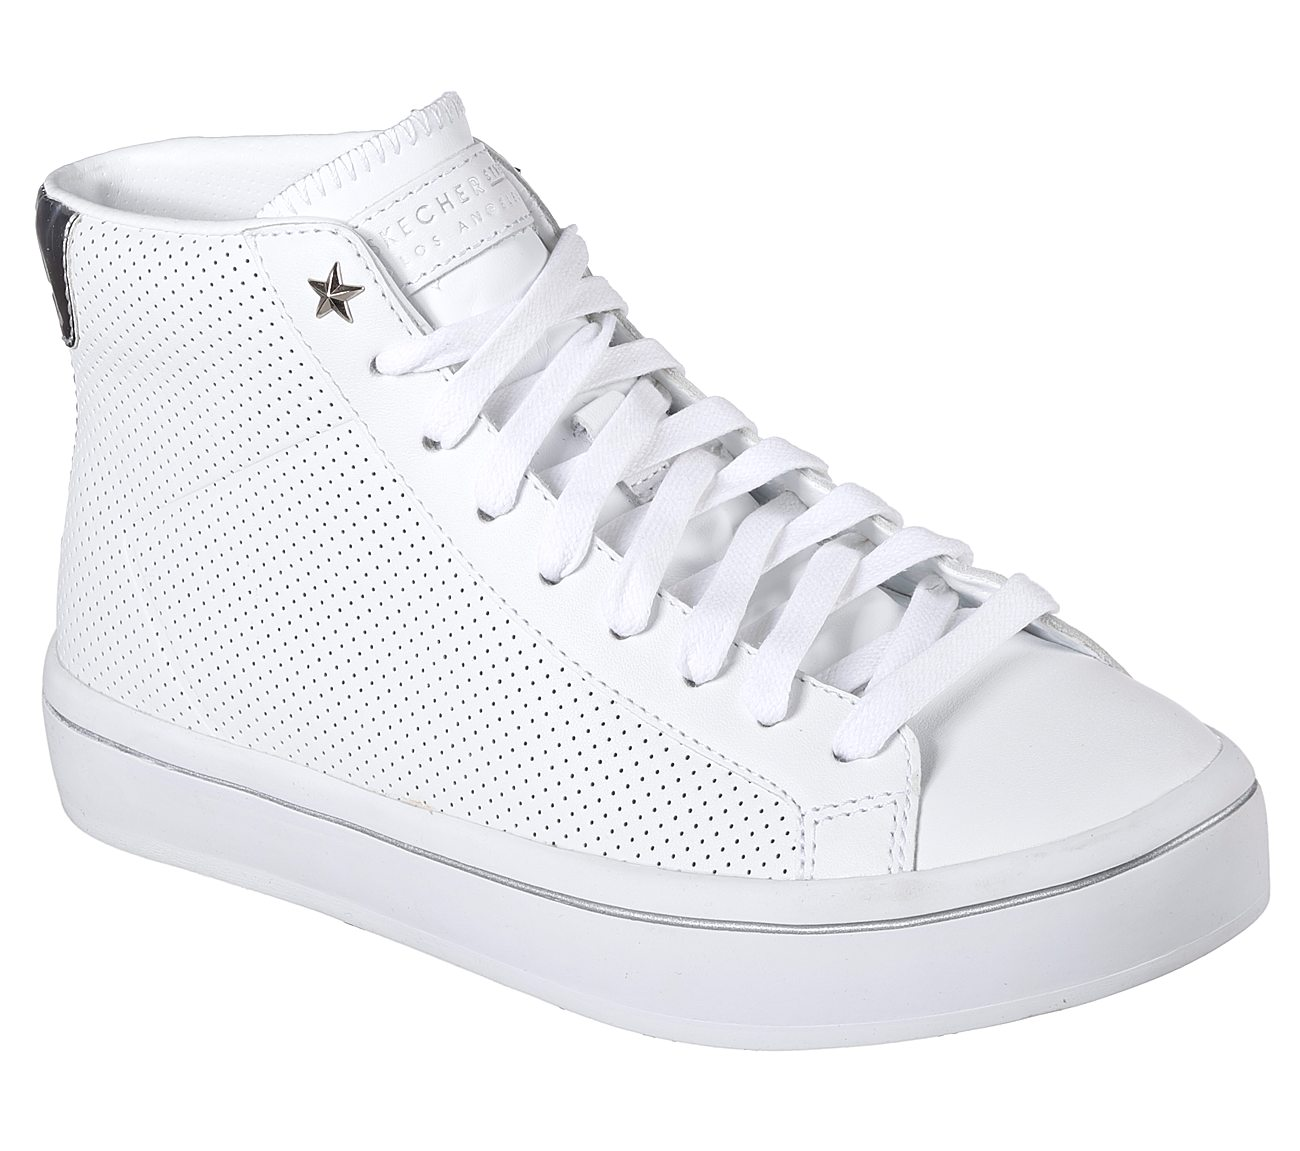 Skechers Hi Lite Shoes for Women